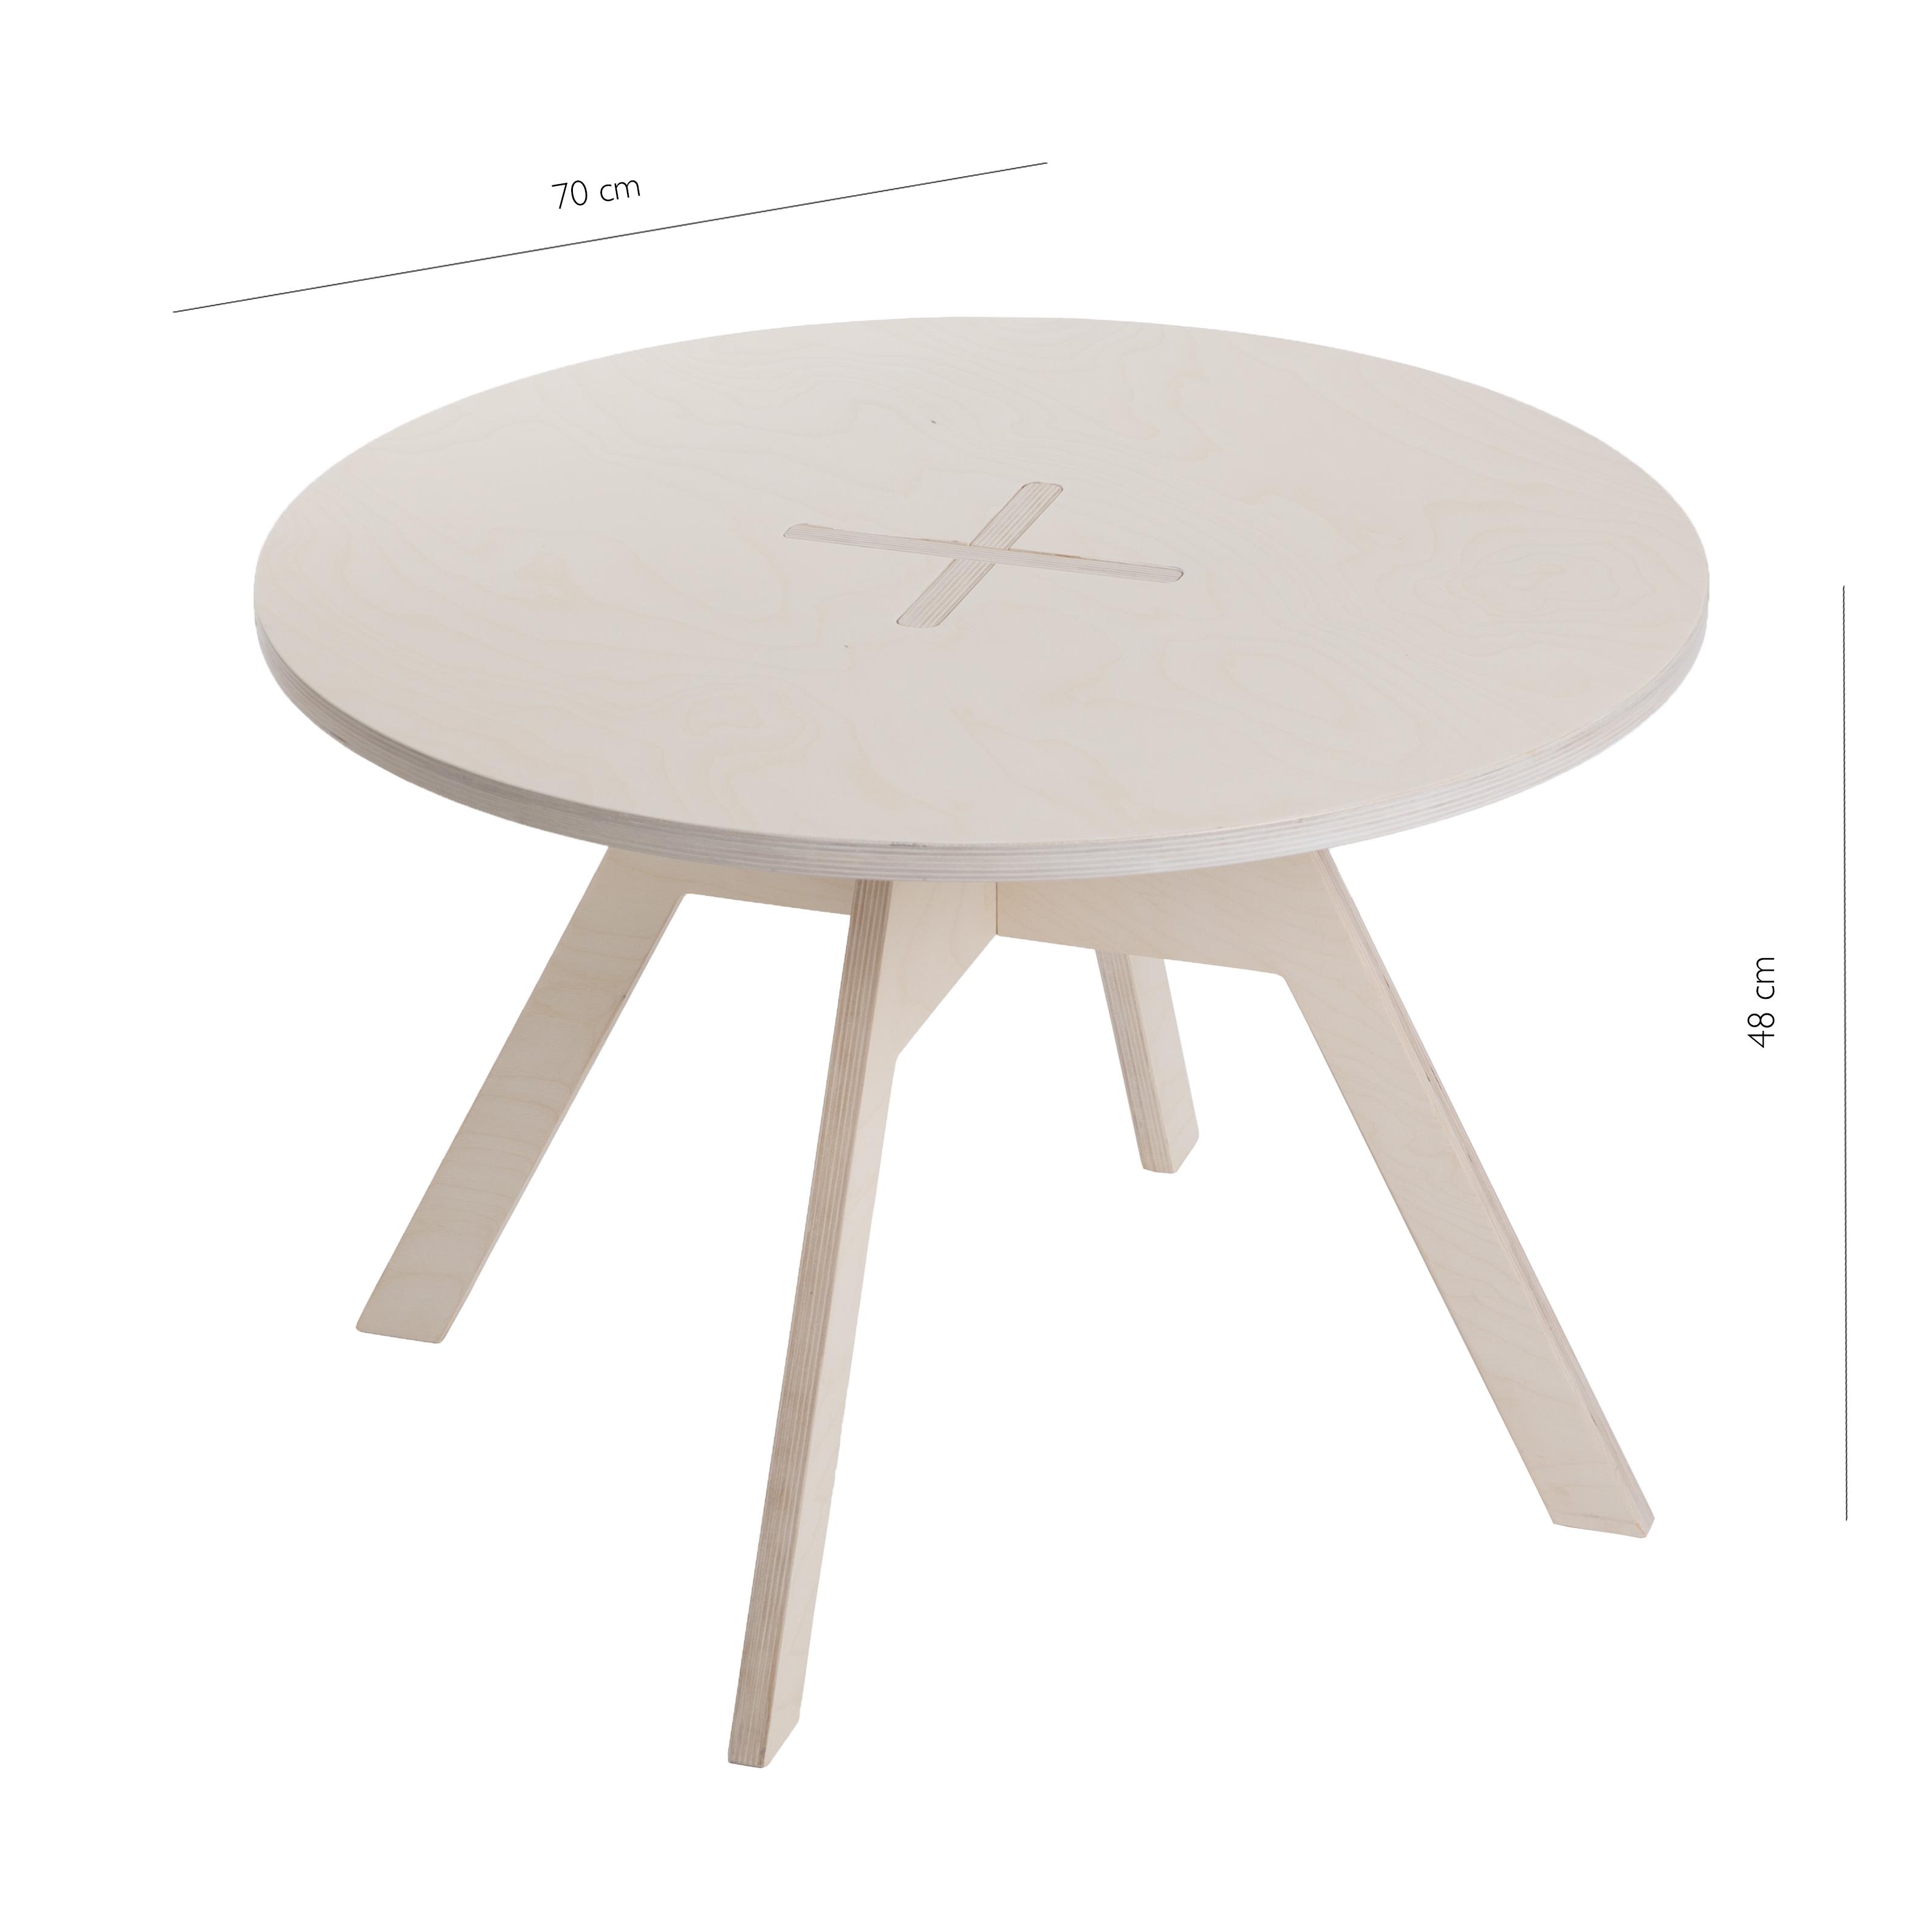 Small round table, white